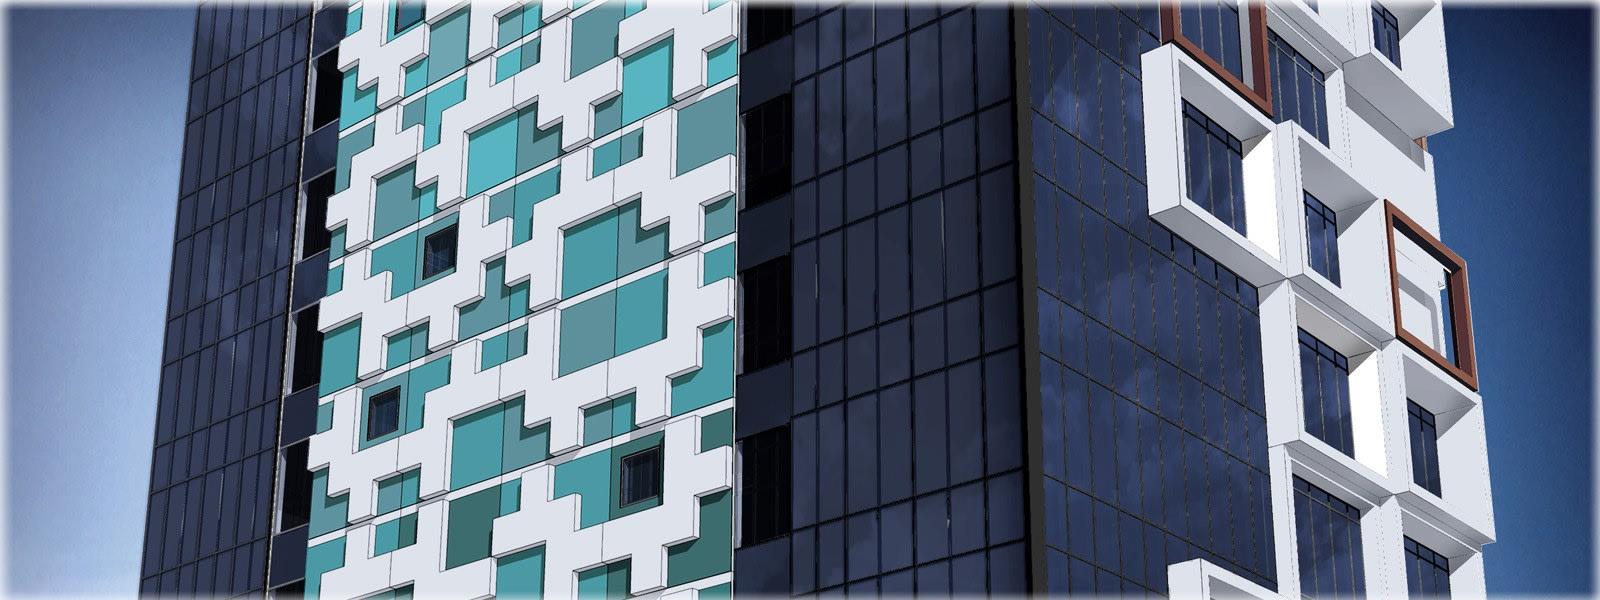 CBD   Quincy Hotel   33-35 King Street   29L   Residential